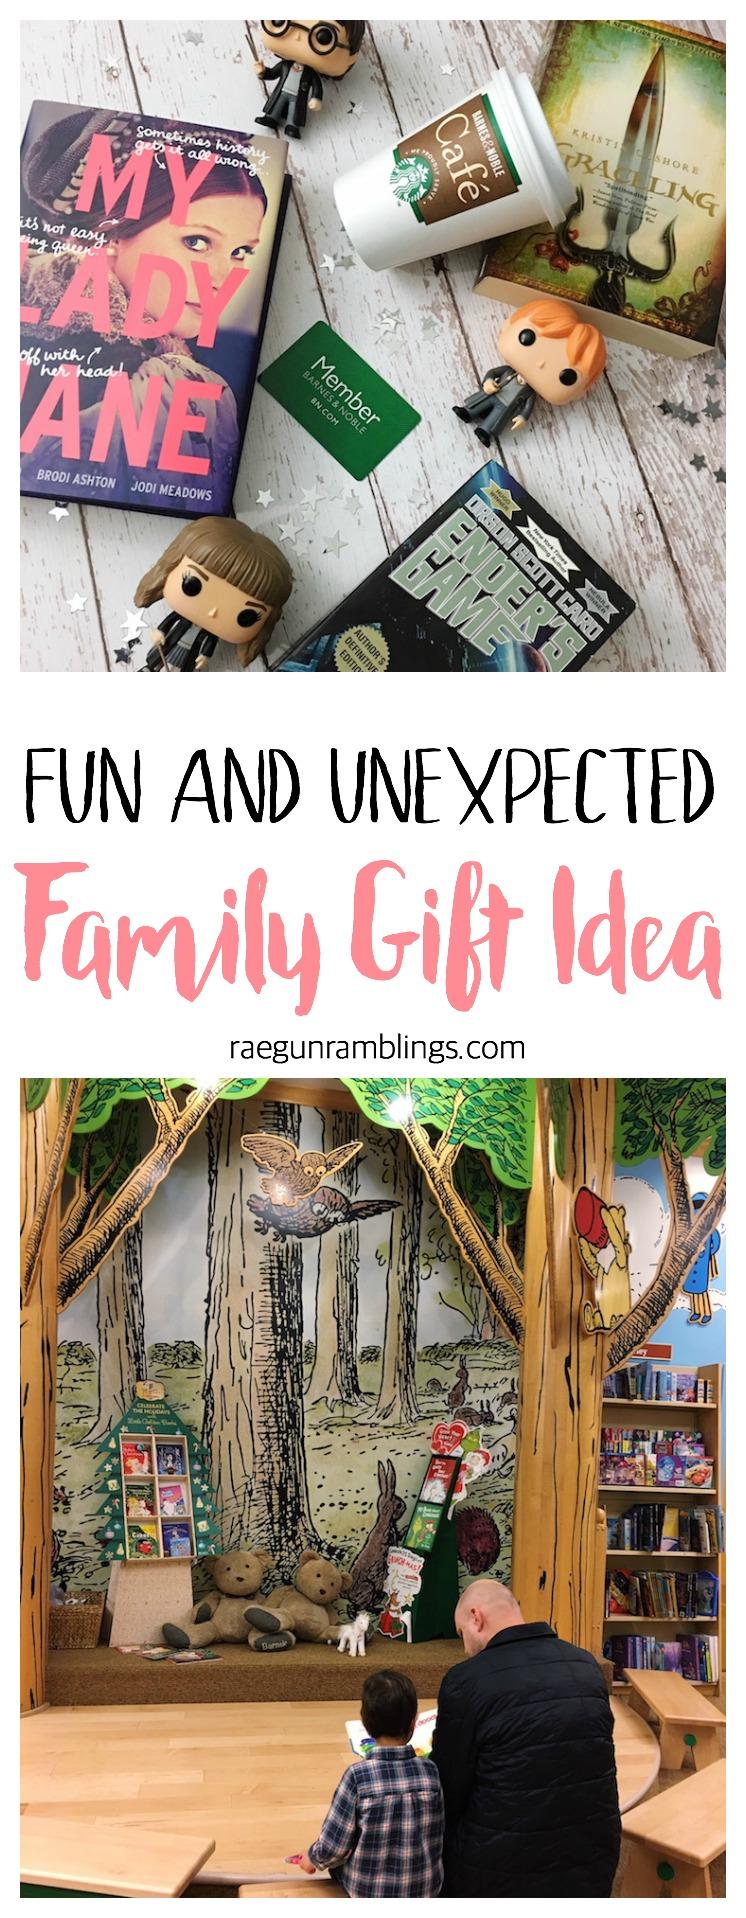 love this idea for a fun an unusual family gift idea